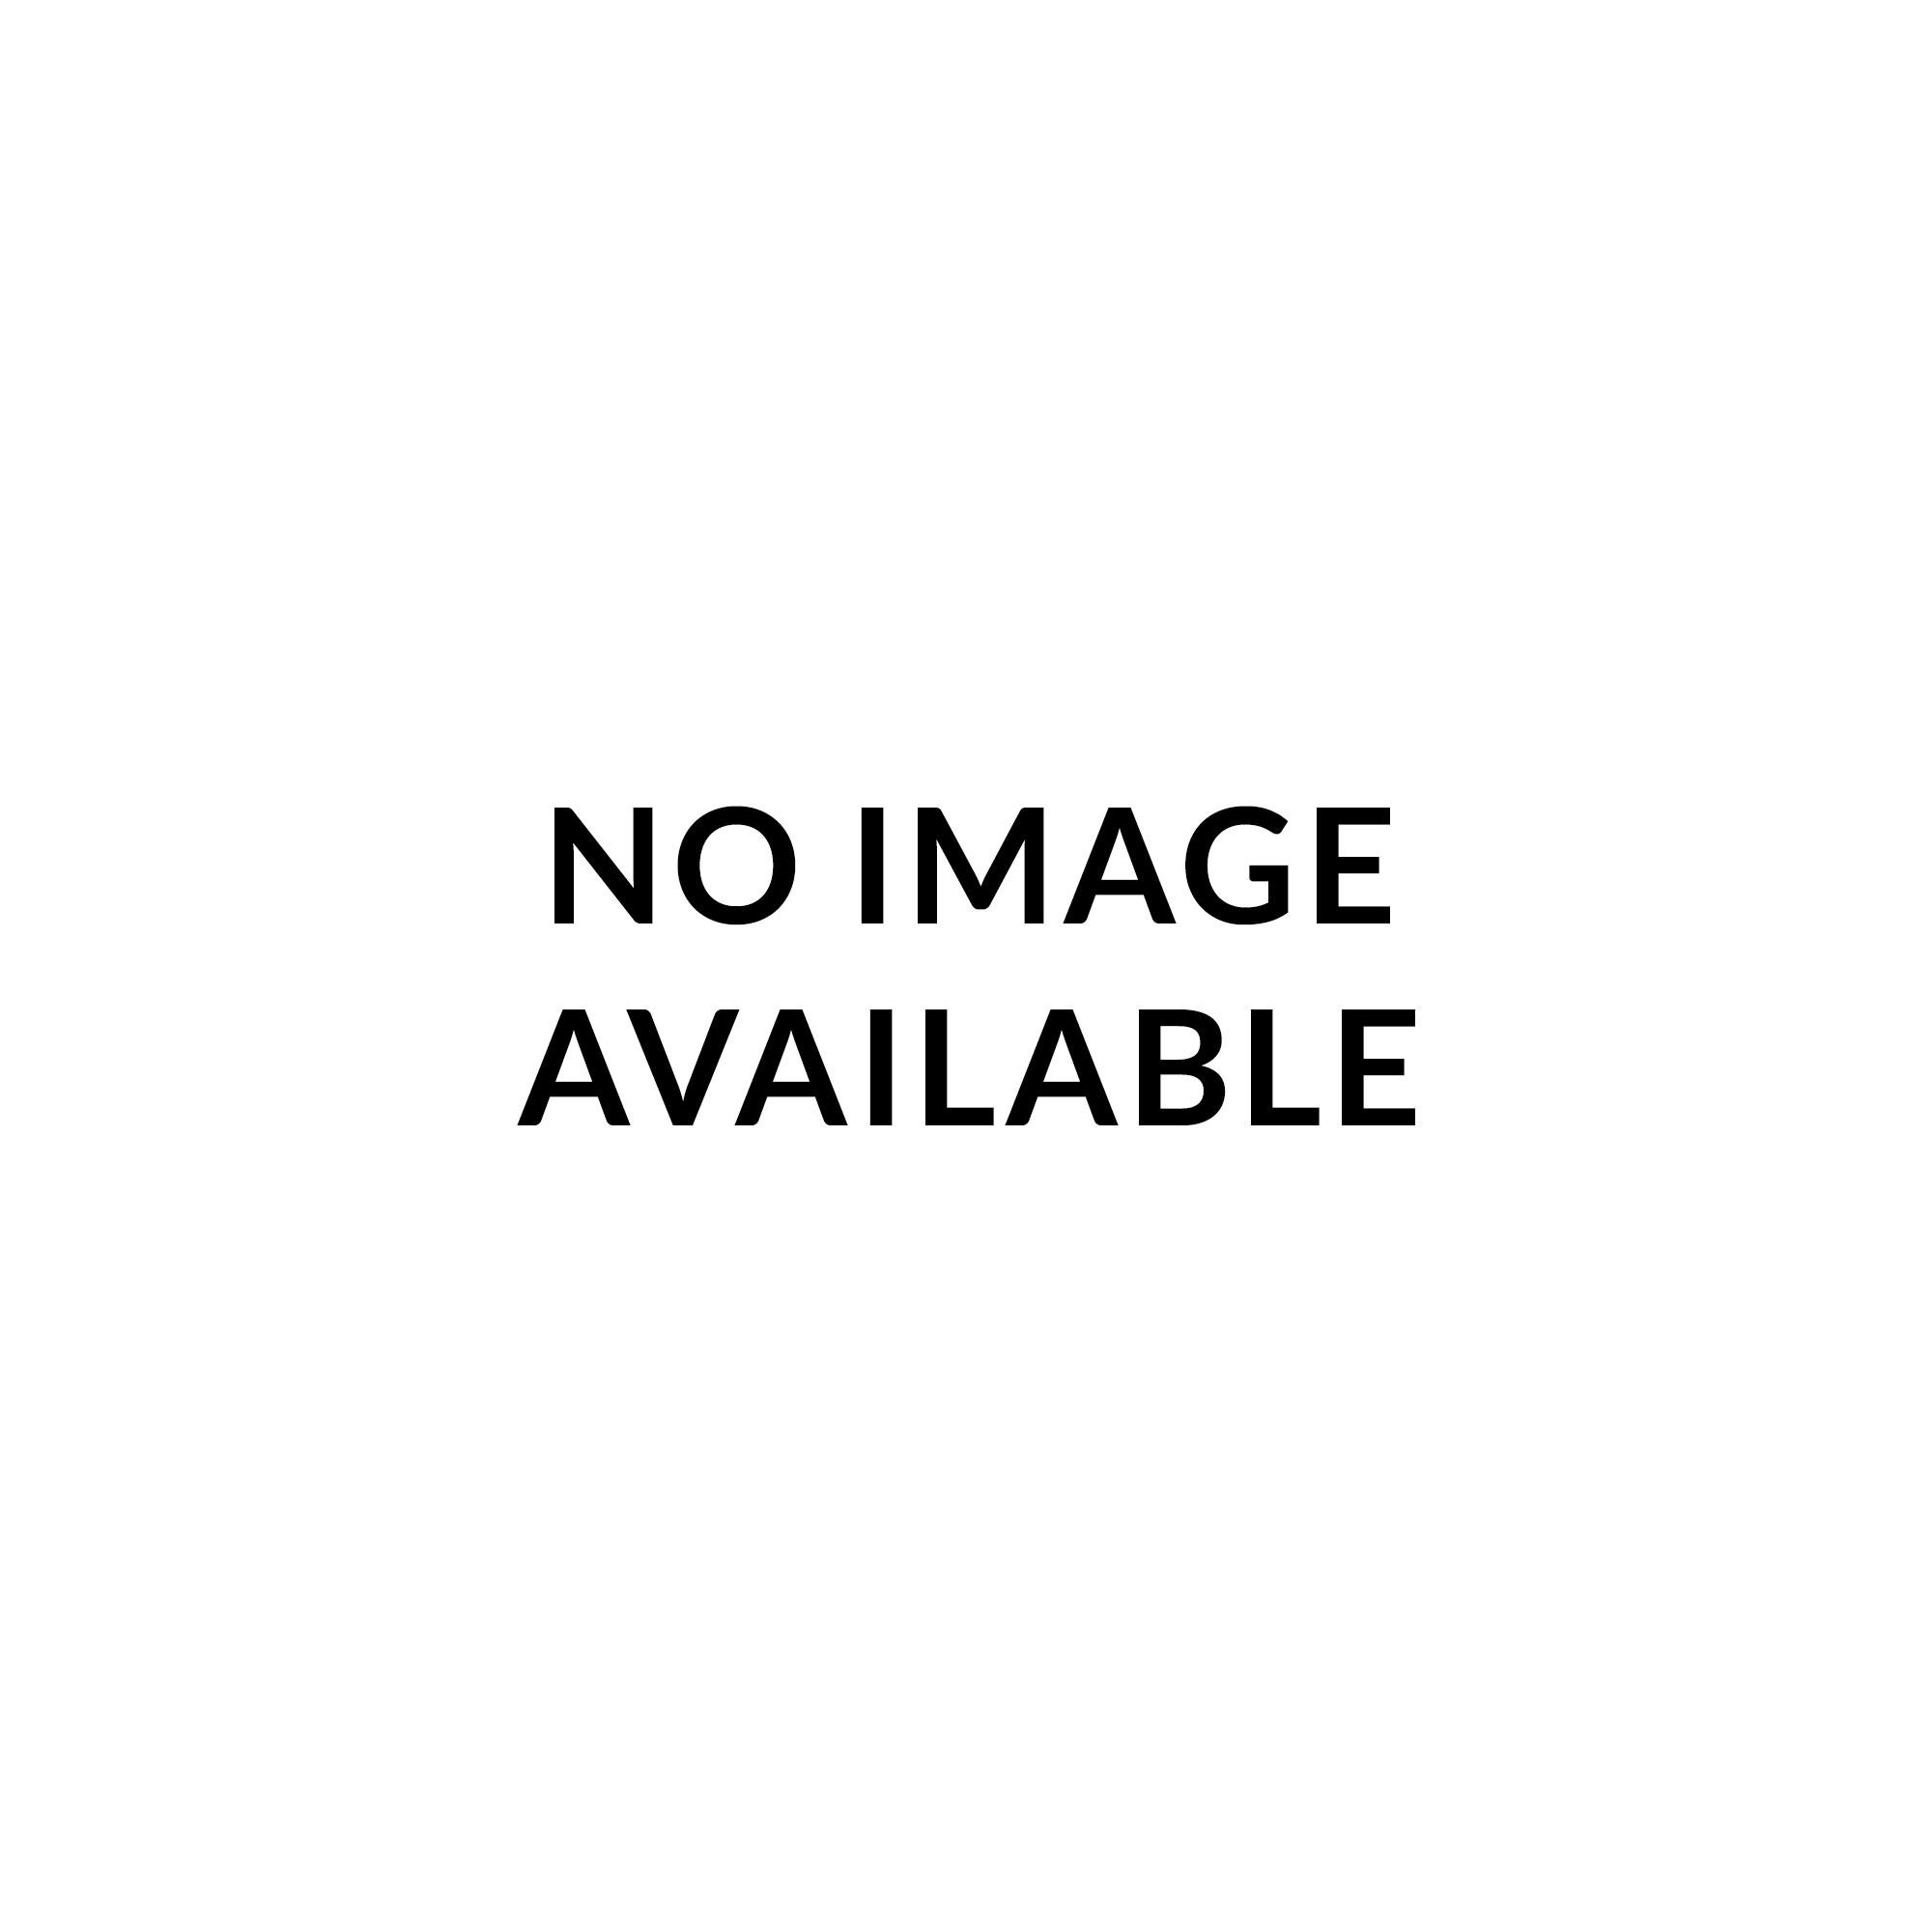 D'Addario PSB105SL ProSteels XL Bass Single String .105 Super Long Scale